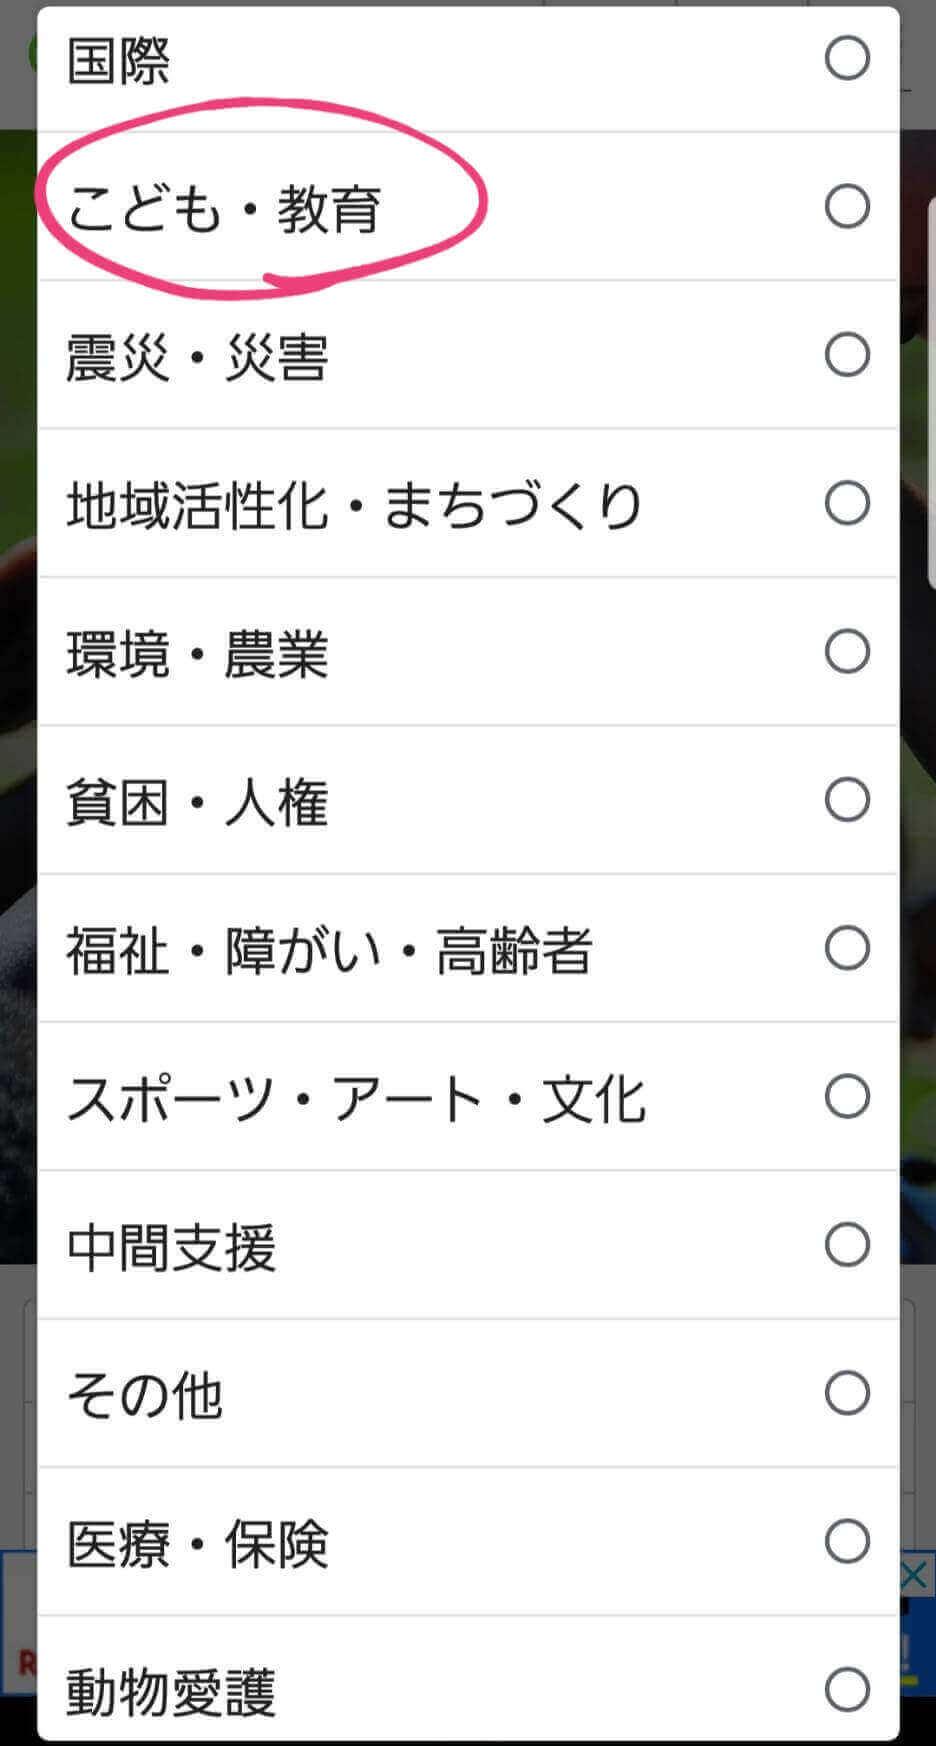 activoのホームページ